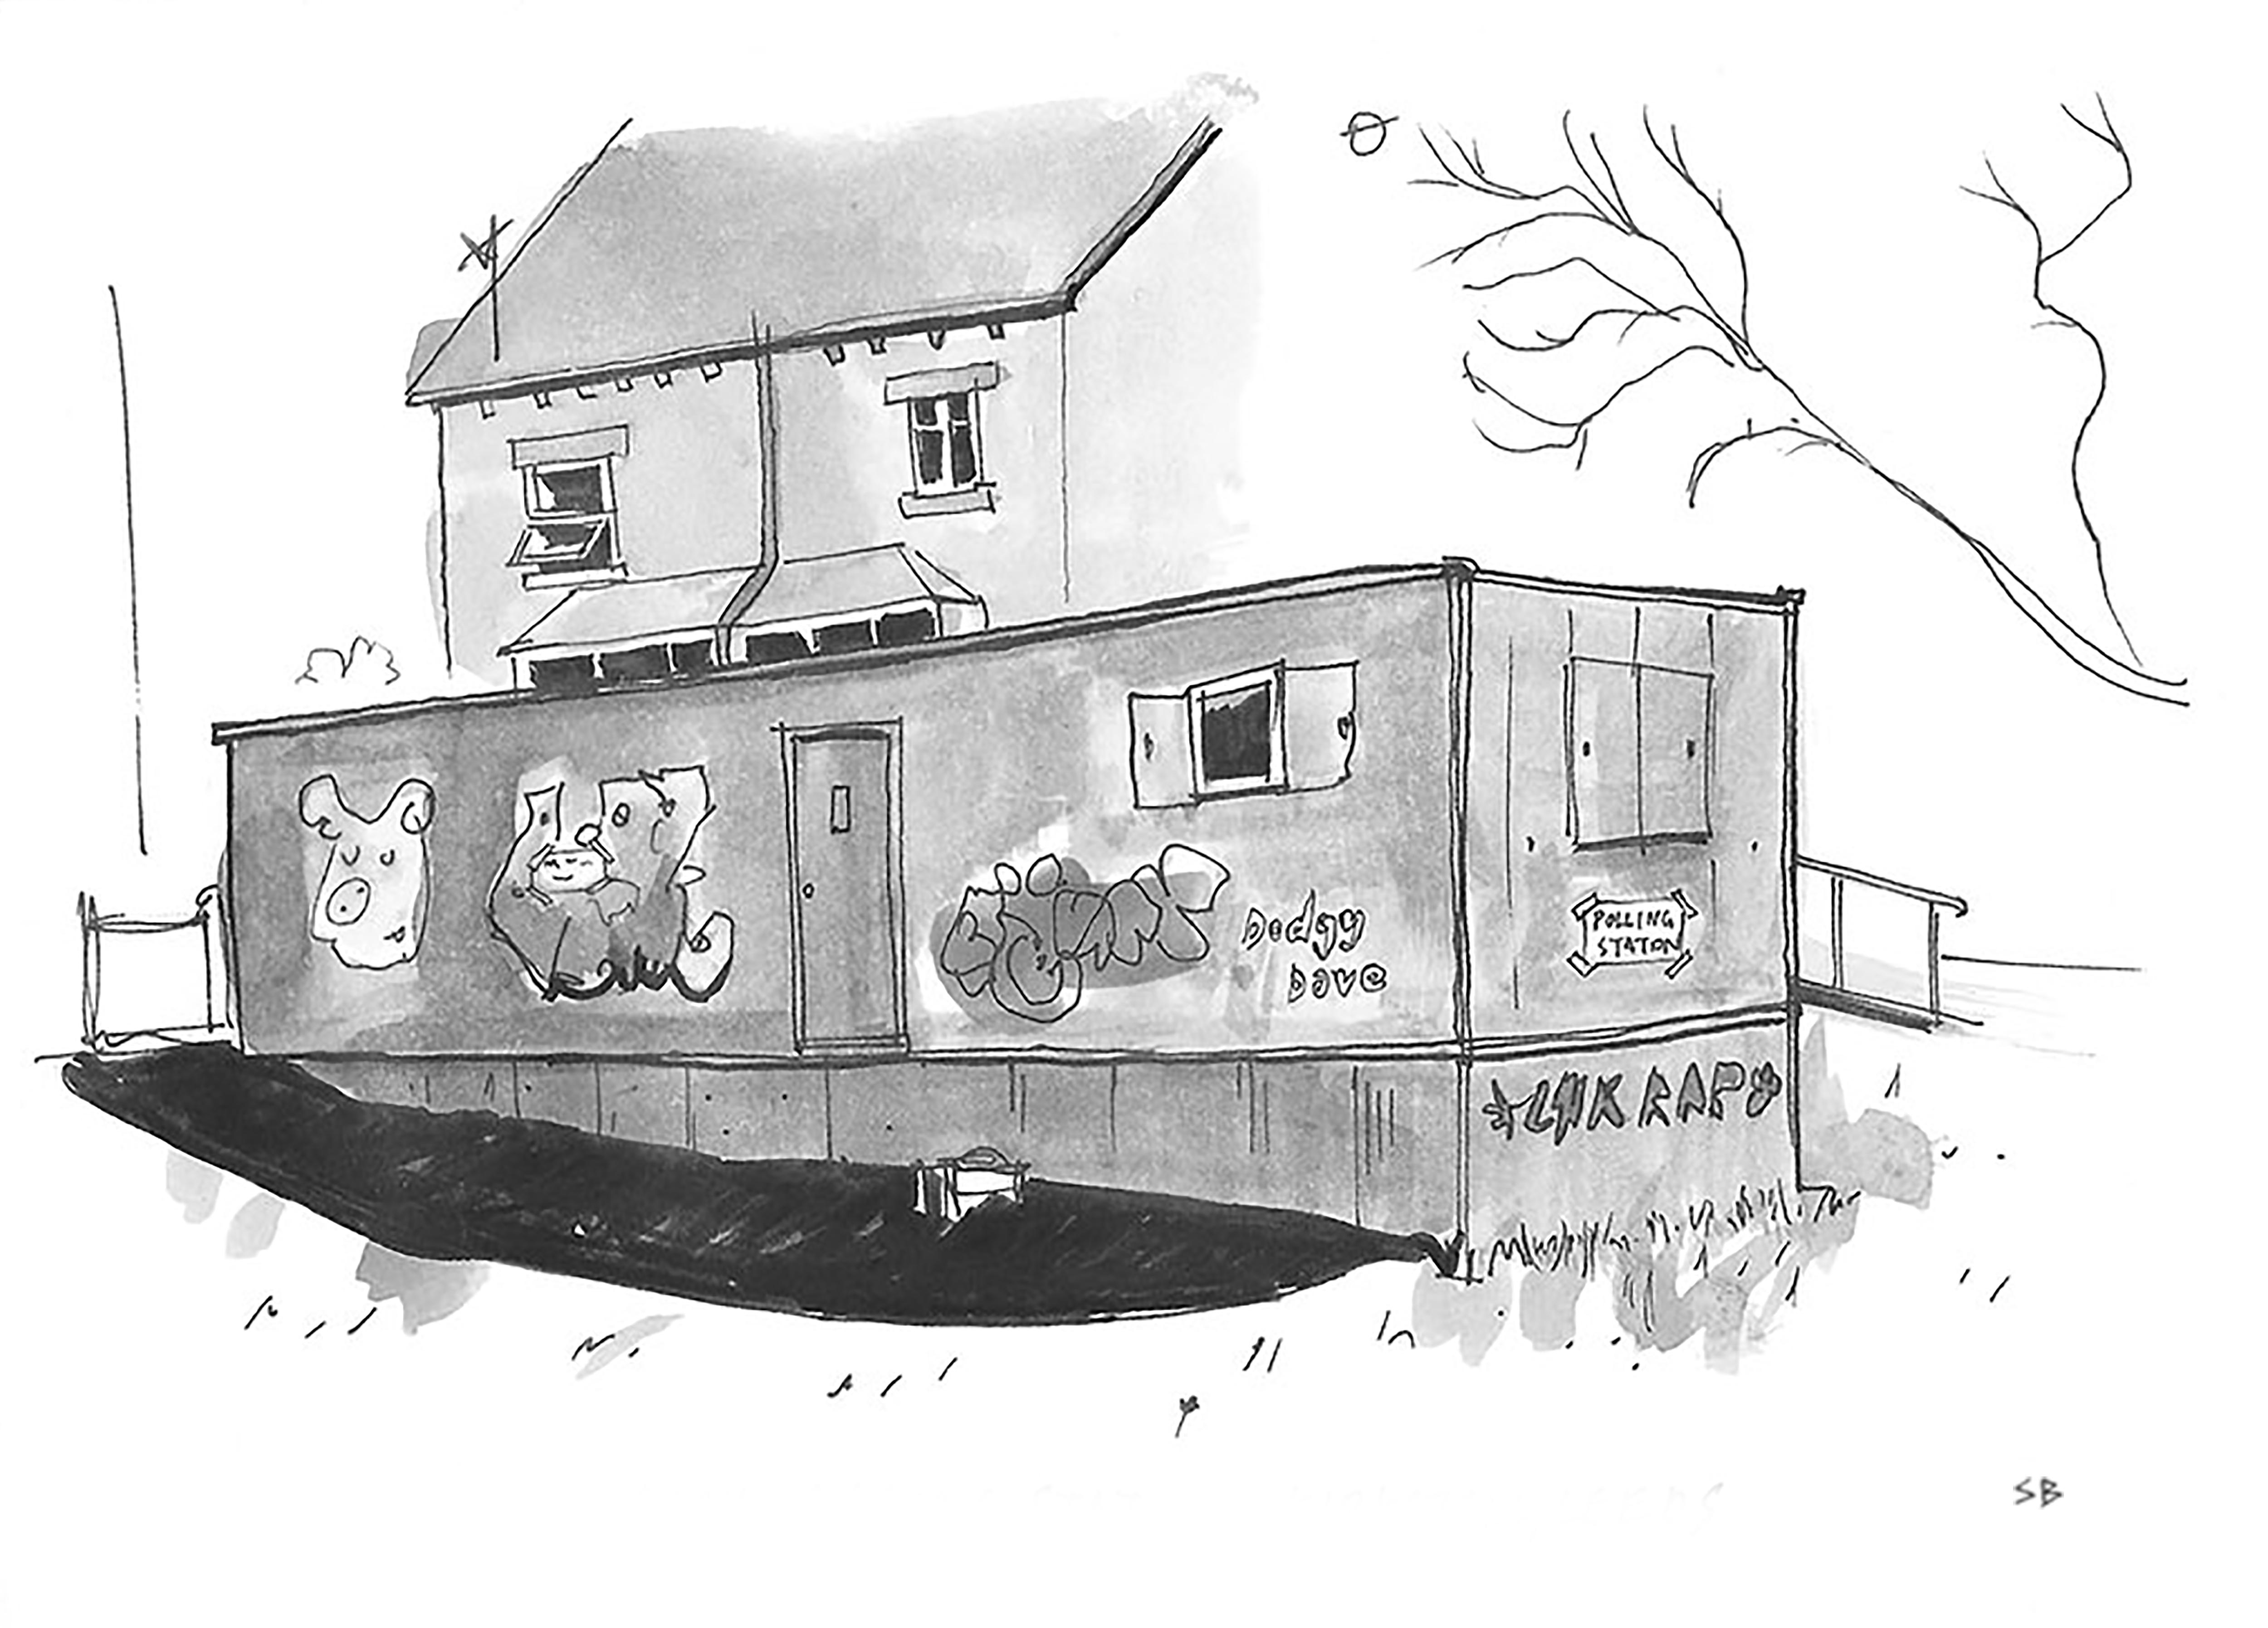 temp-temporary-polling-station-kirkstall-leeds-urban-sketch-pen-ink-watercolour-steve-beadle-art